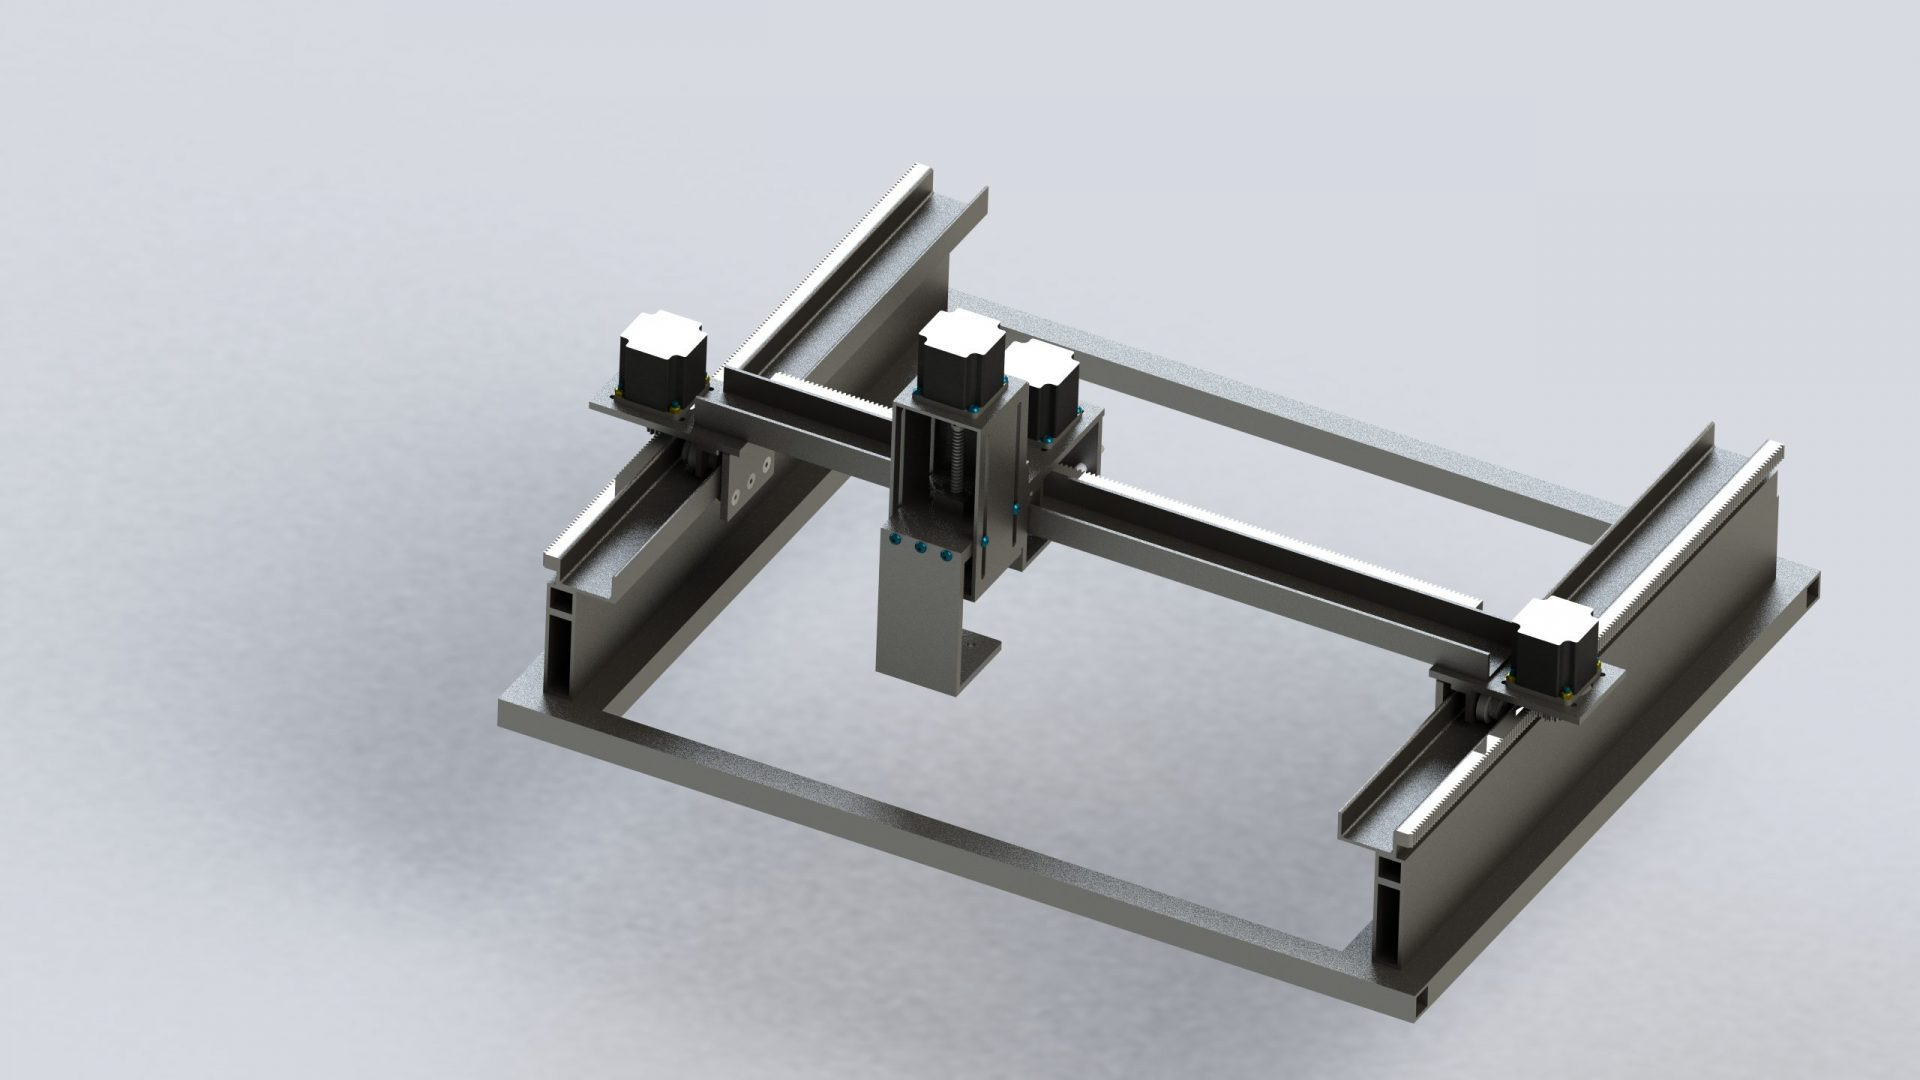 CNC Plasma Cutter Build